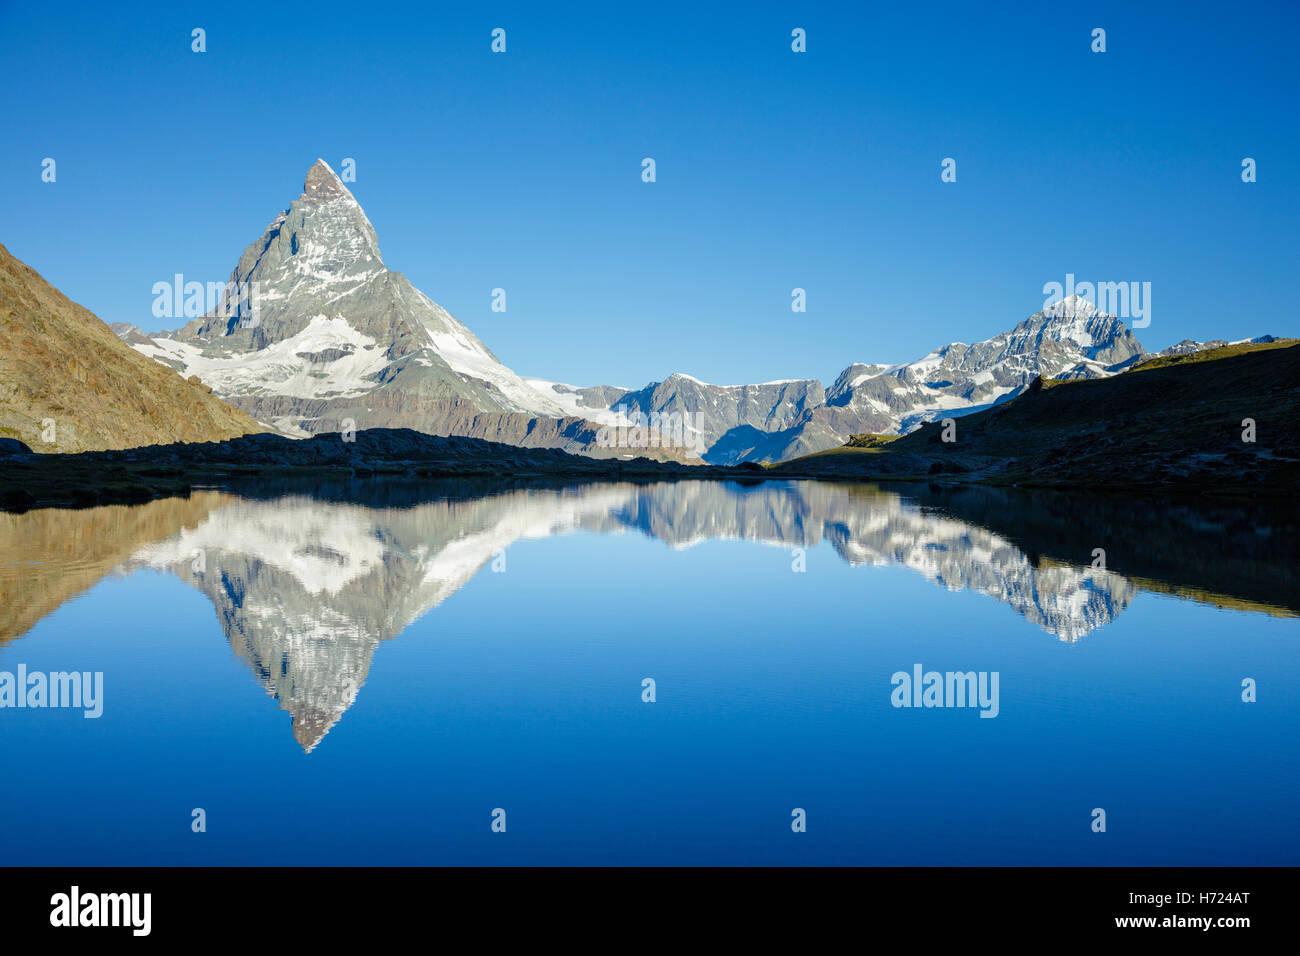 Il Cervino riflesso nel Riffelsee, Zermatt, Pennine, Vallese, Svizzera. Foto Stock